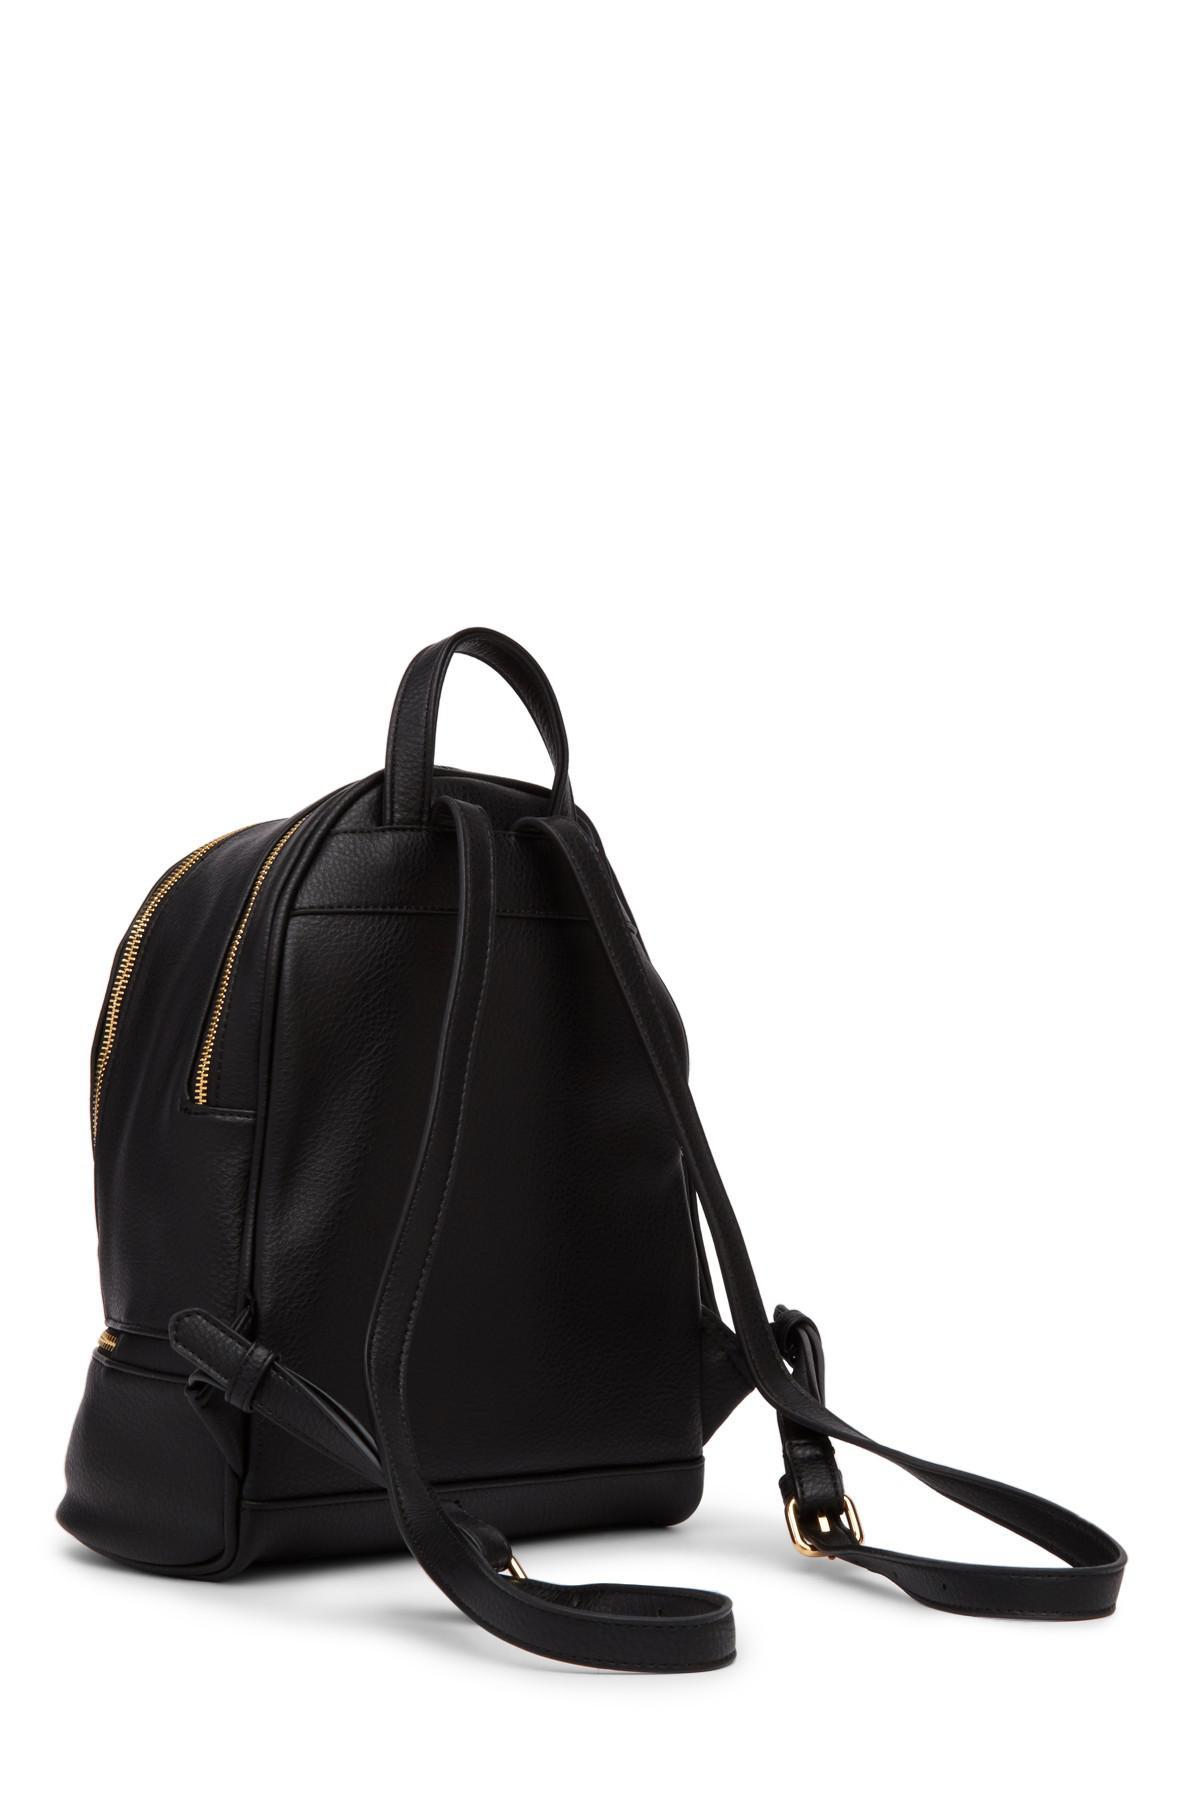 8ffdb5991b Lyst - Urban Expressions Ashleigh Vegan Leather Backpack in Black